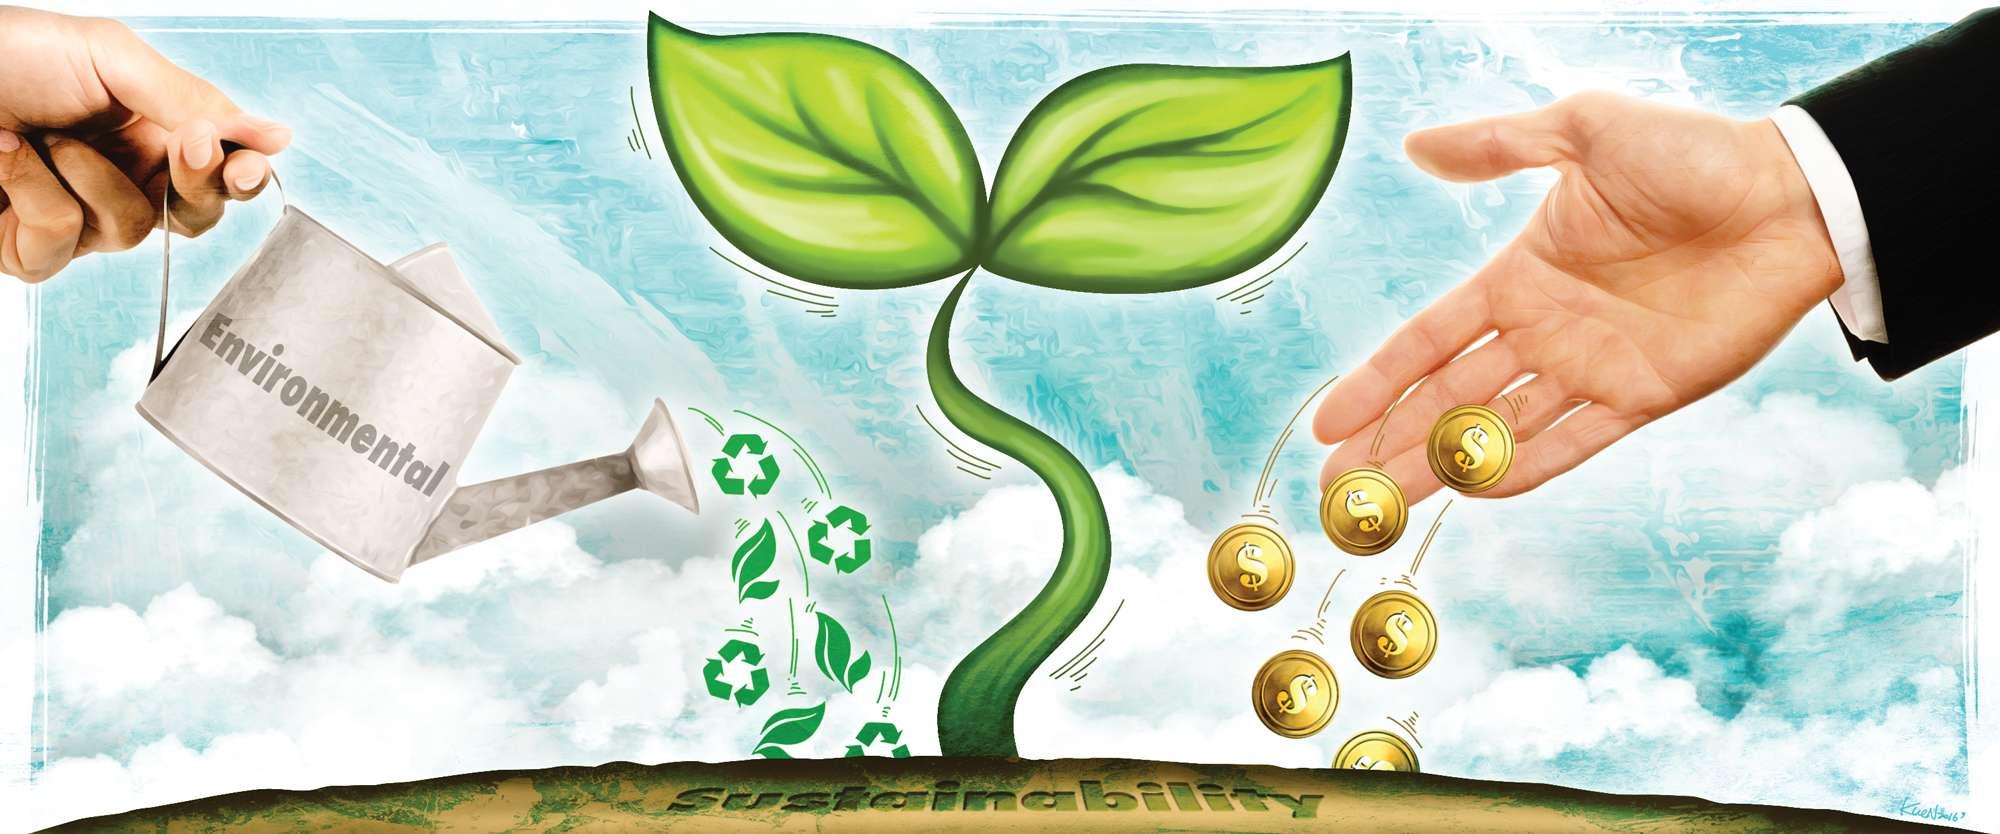 industrial development vs environmental protection essay